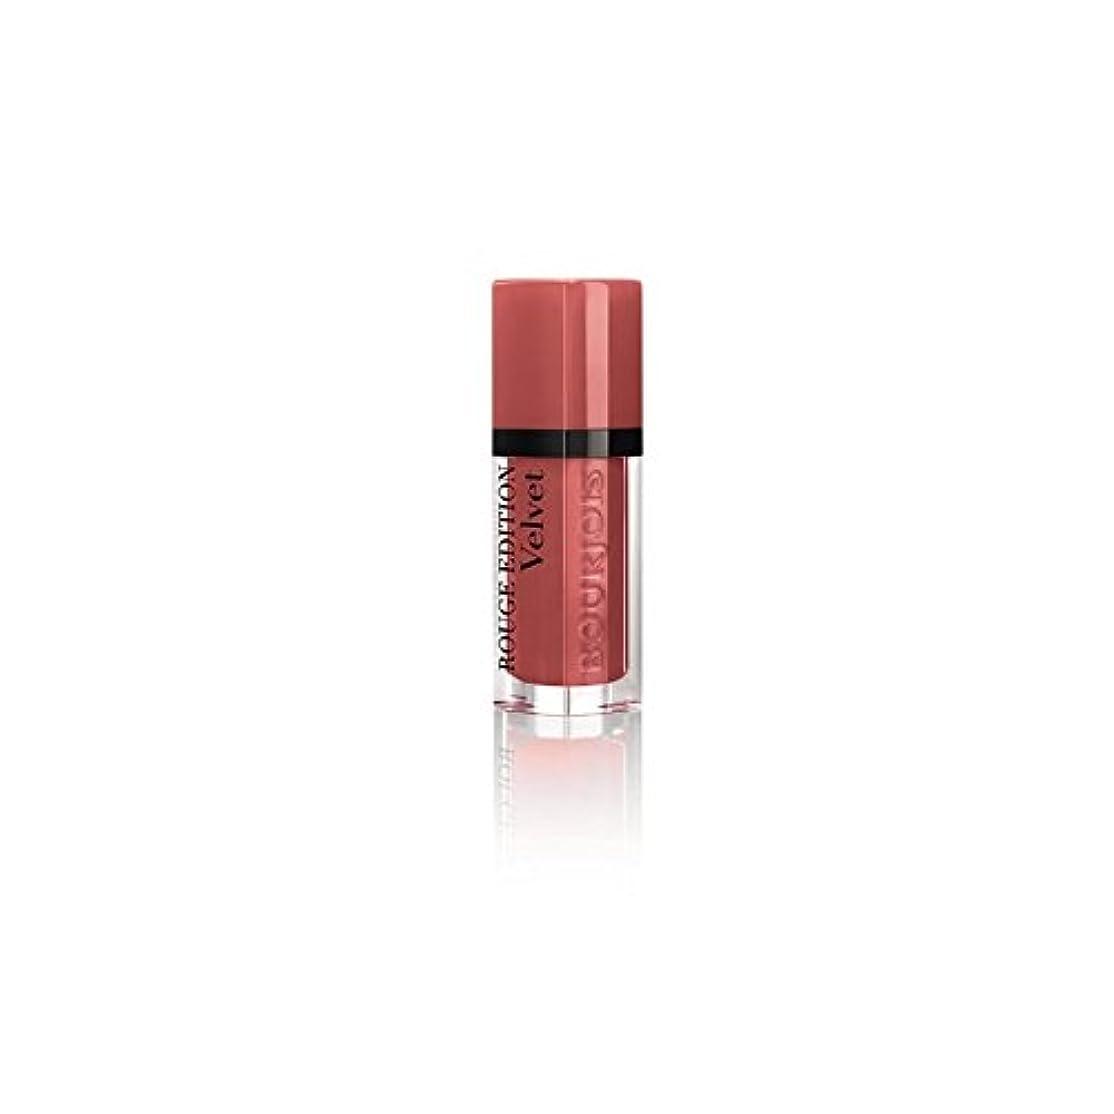 Bourjois Rouge Edition Velvet Lipstick Beau Brun T12 - ブルジョワルージュ版ベルベットの口紅ボウ?ブラン 12 [並行輸入品]